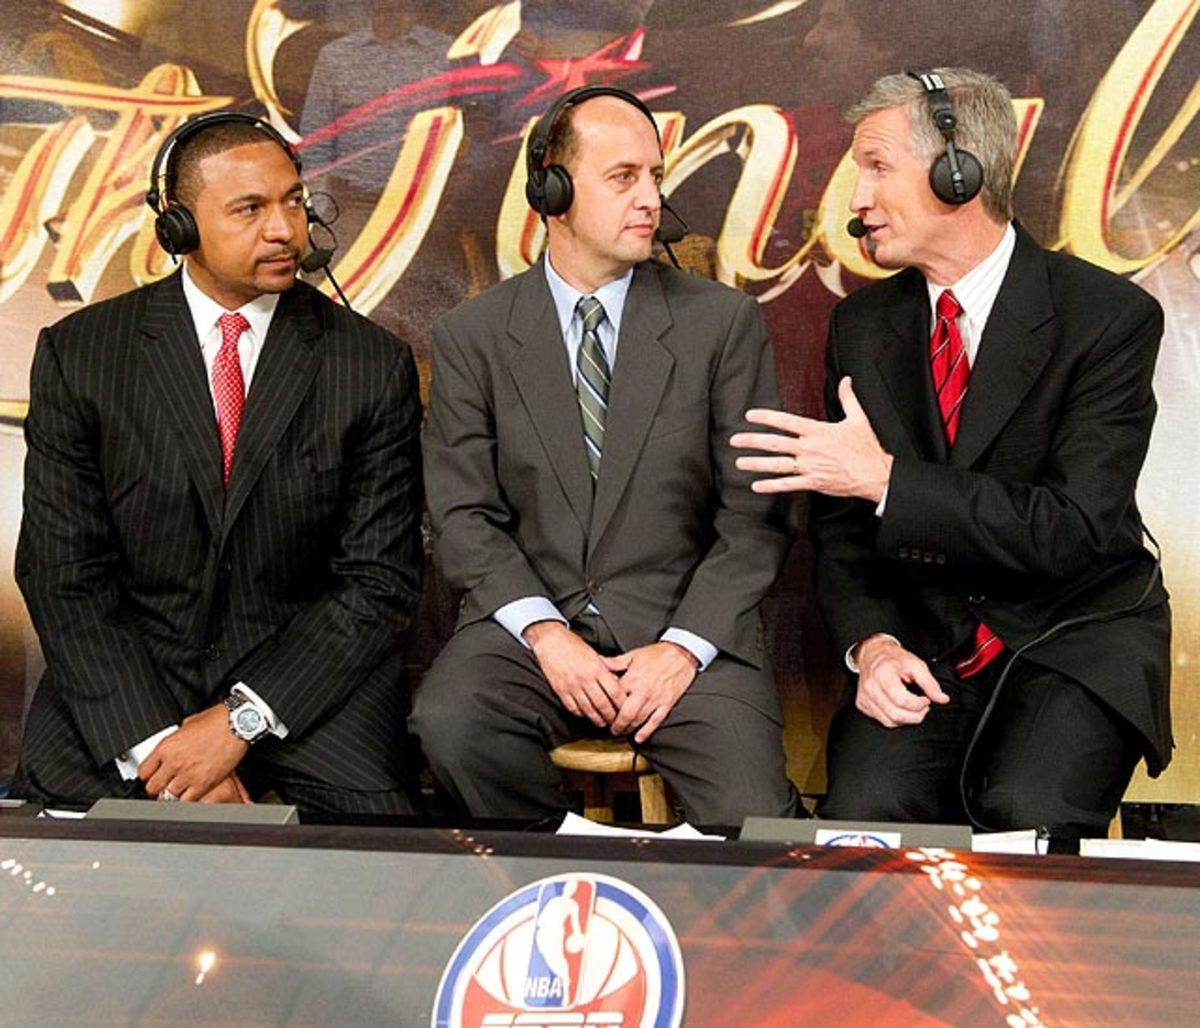 Mark Jackson, Jeff Van Gundy and Mike Breen